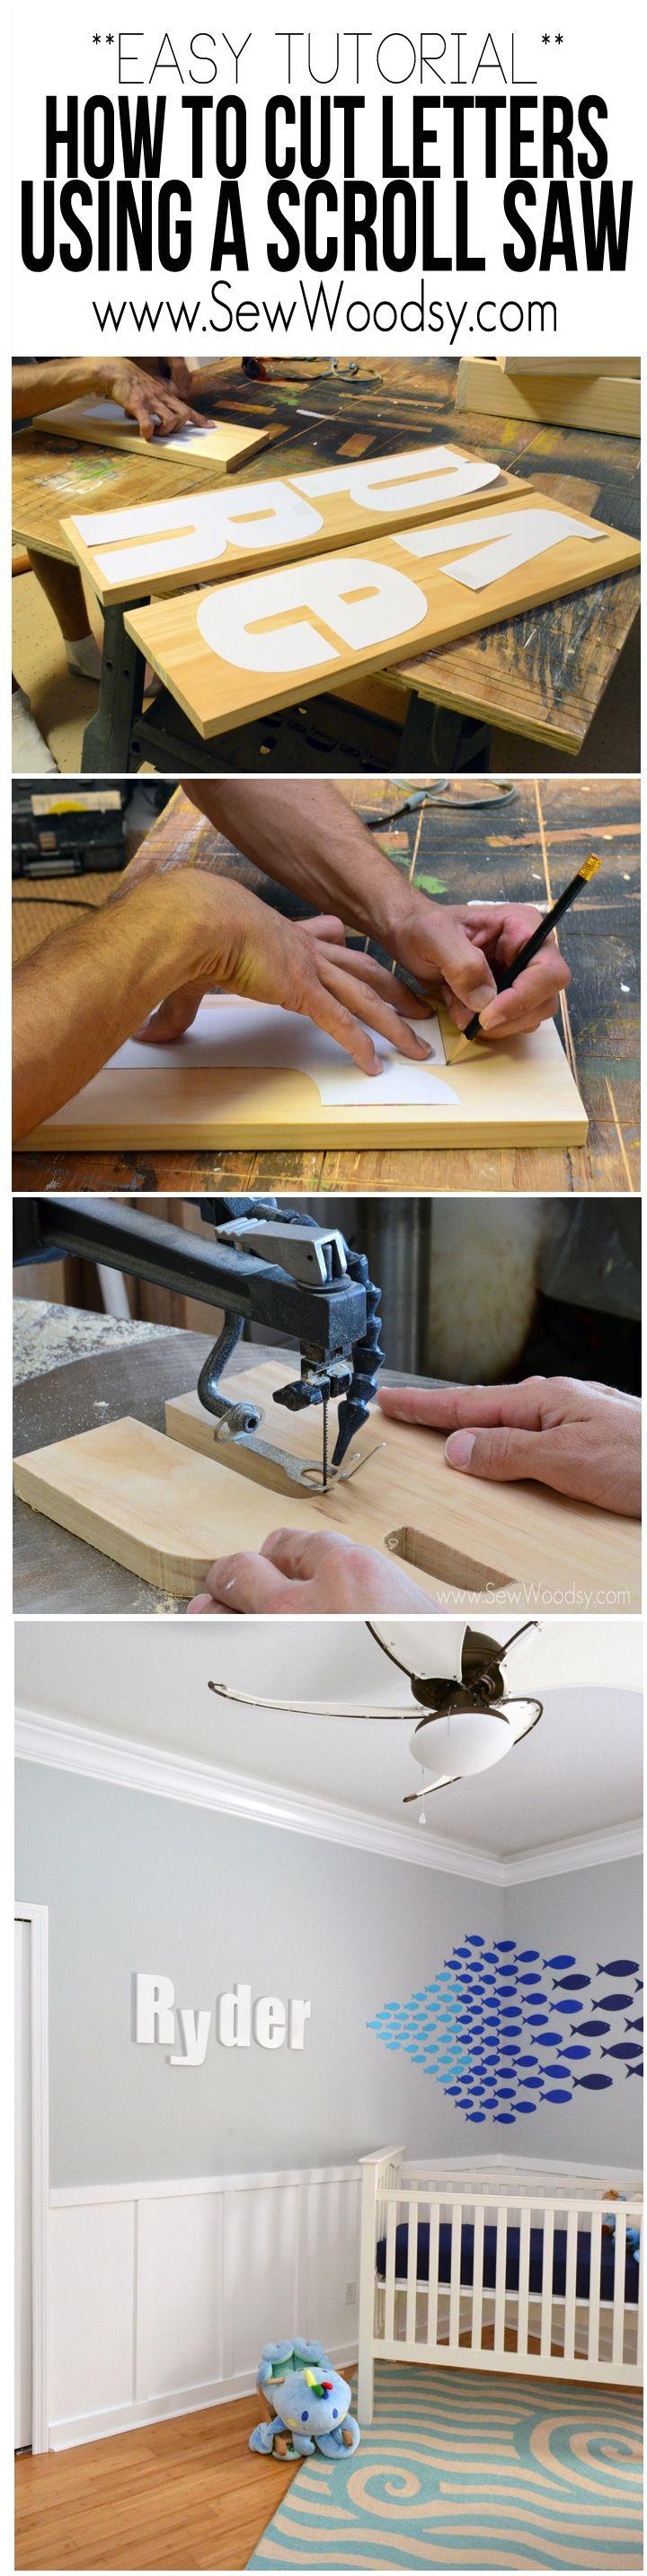 Easy Tutorial on How to Cut Letters Using a Scroll Saw #3MDIY #3MPartner @3mdiy